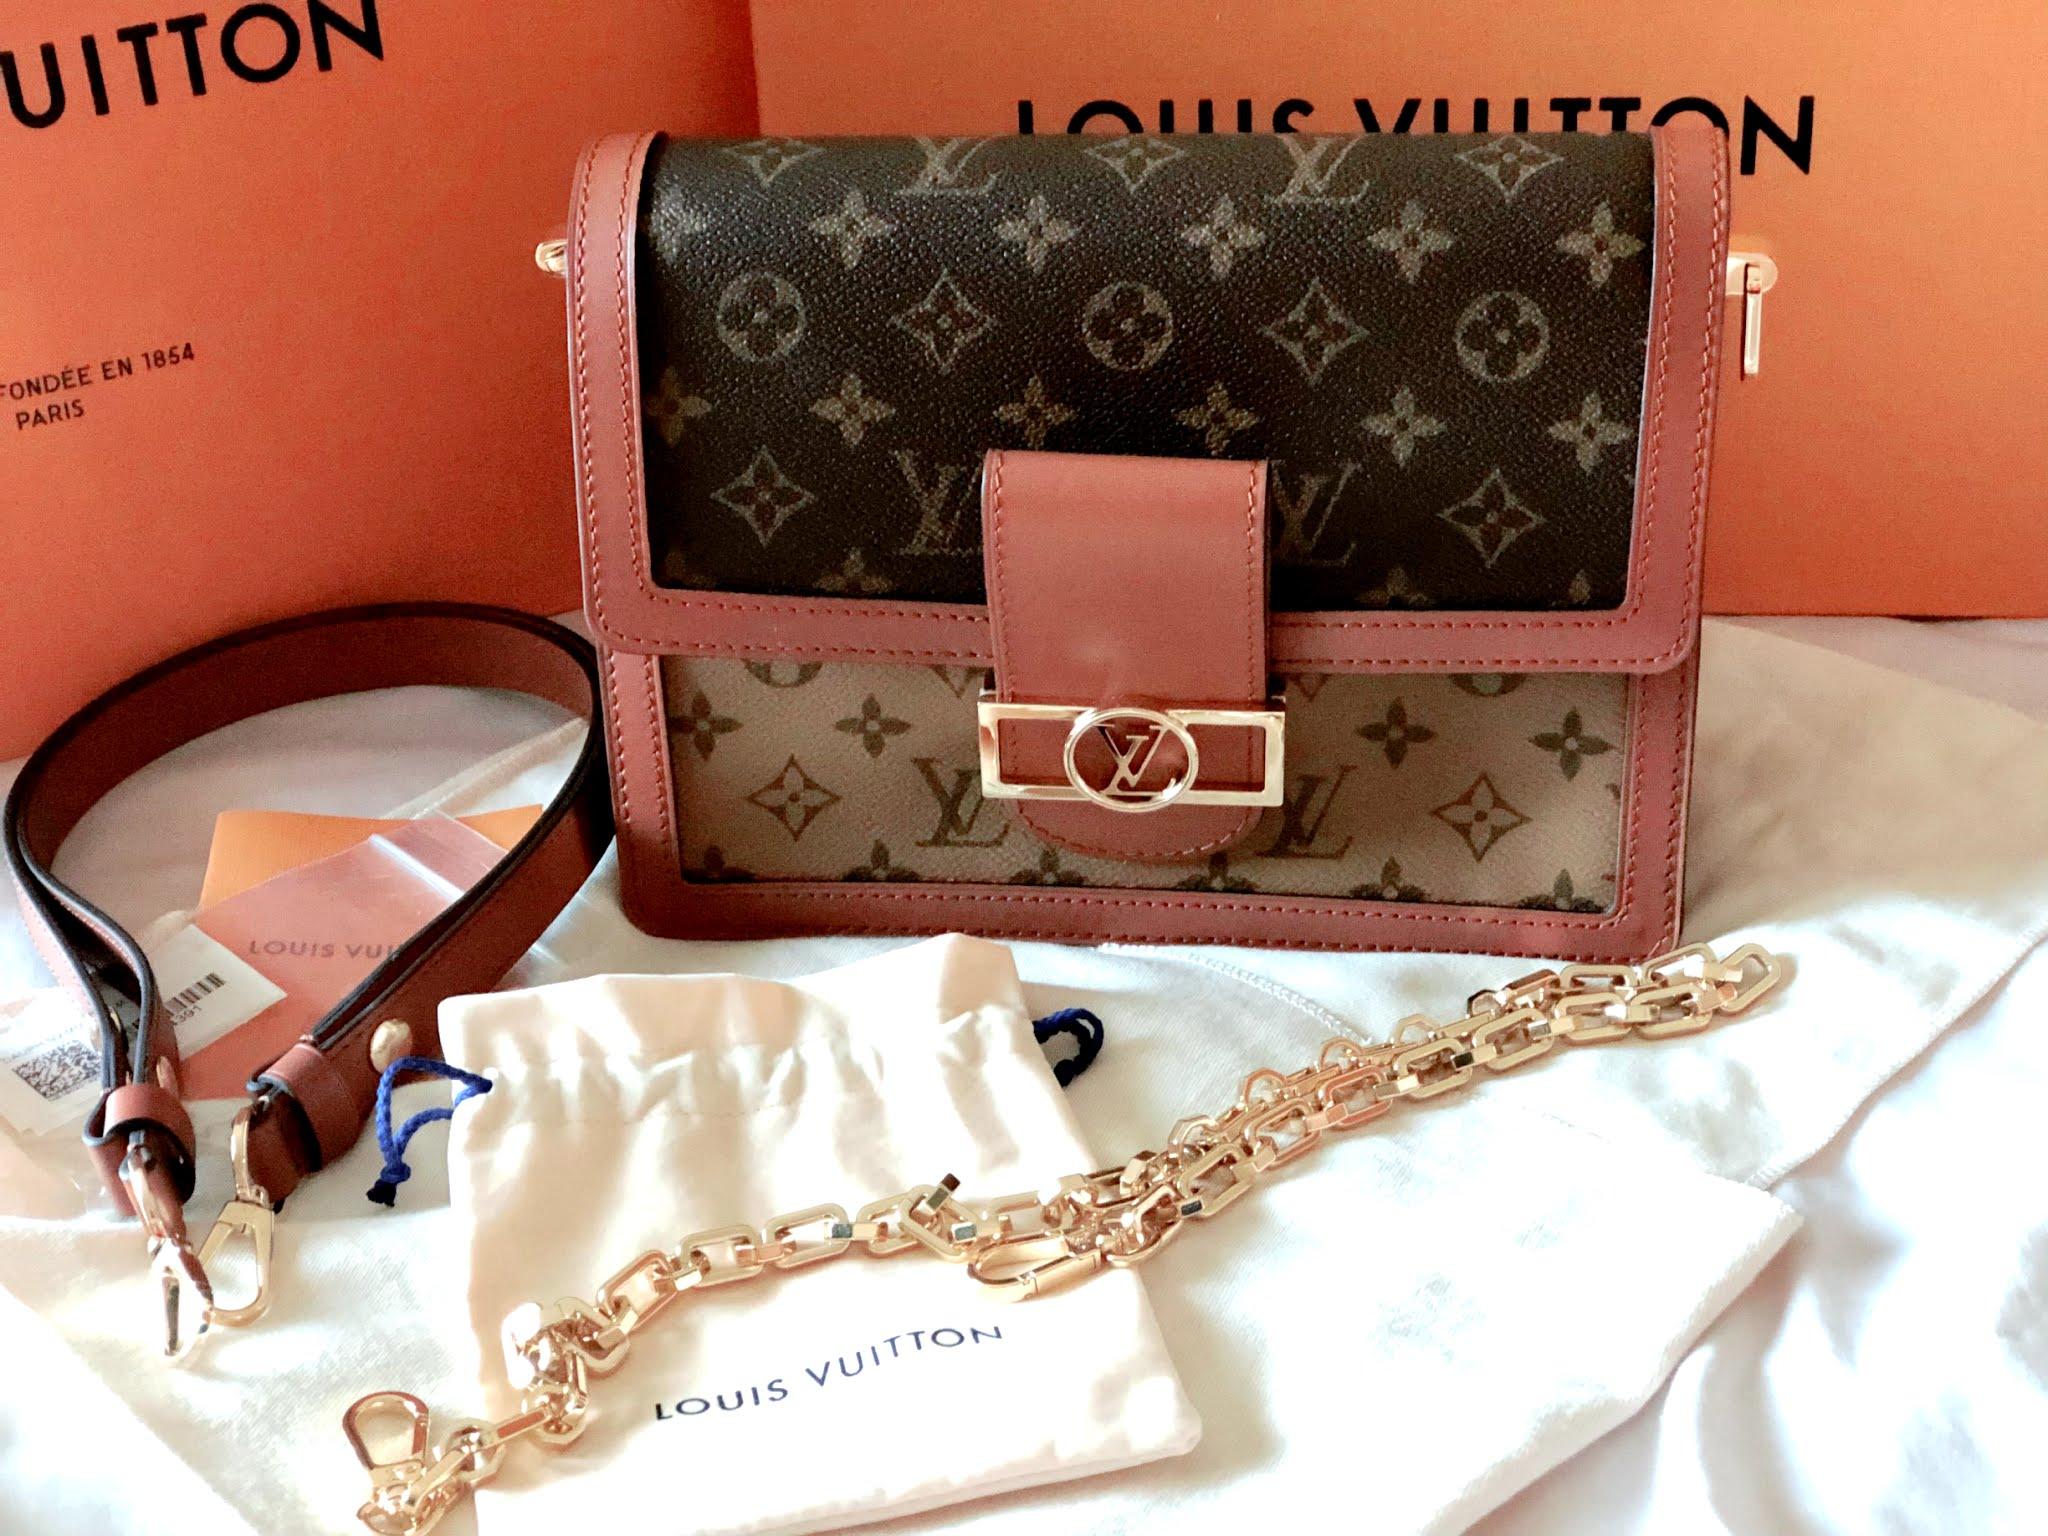 Louis Vuitton Dauphine MM handbag reveal